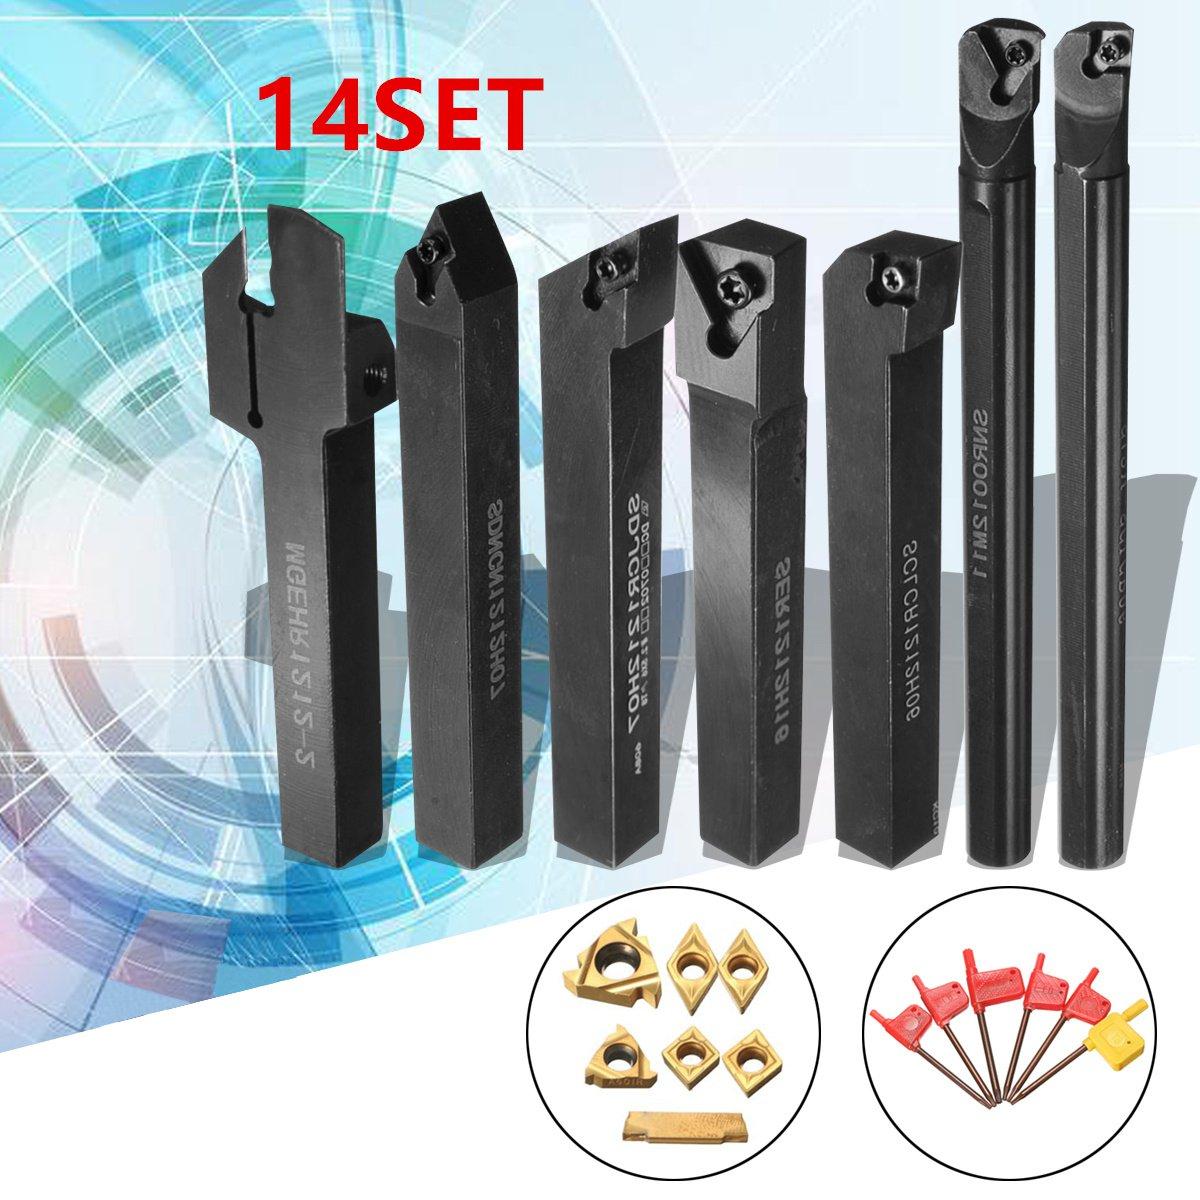 12mm 21Pcs Set Shank Lathe Turning Tool Holder Boring Bar Insert Wrench S12M SCLCR06 SER1212H16 SCL1212H06